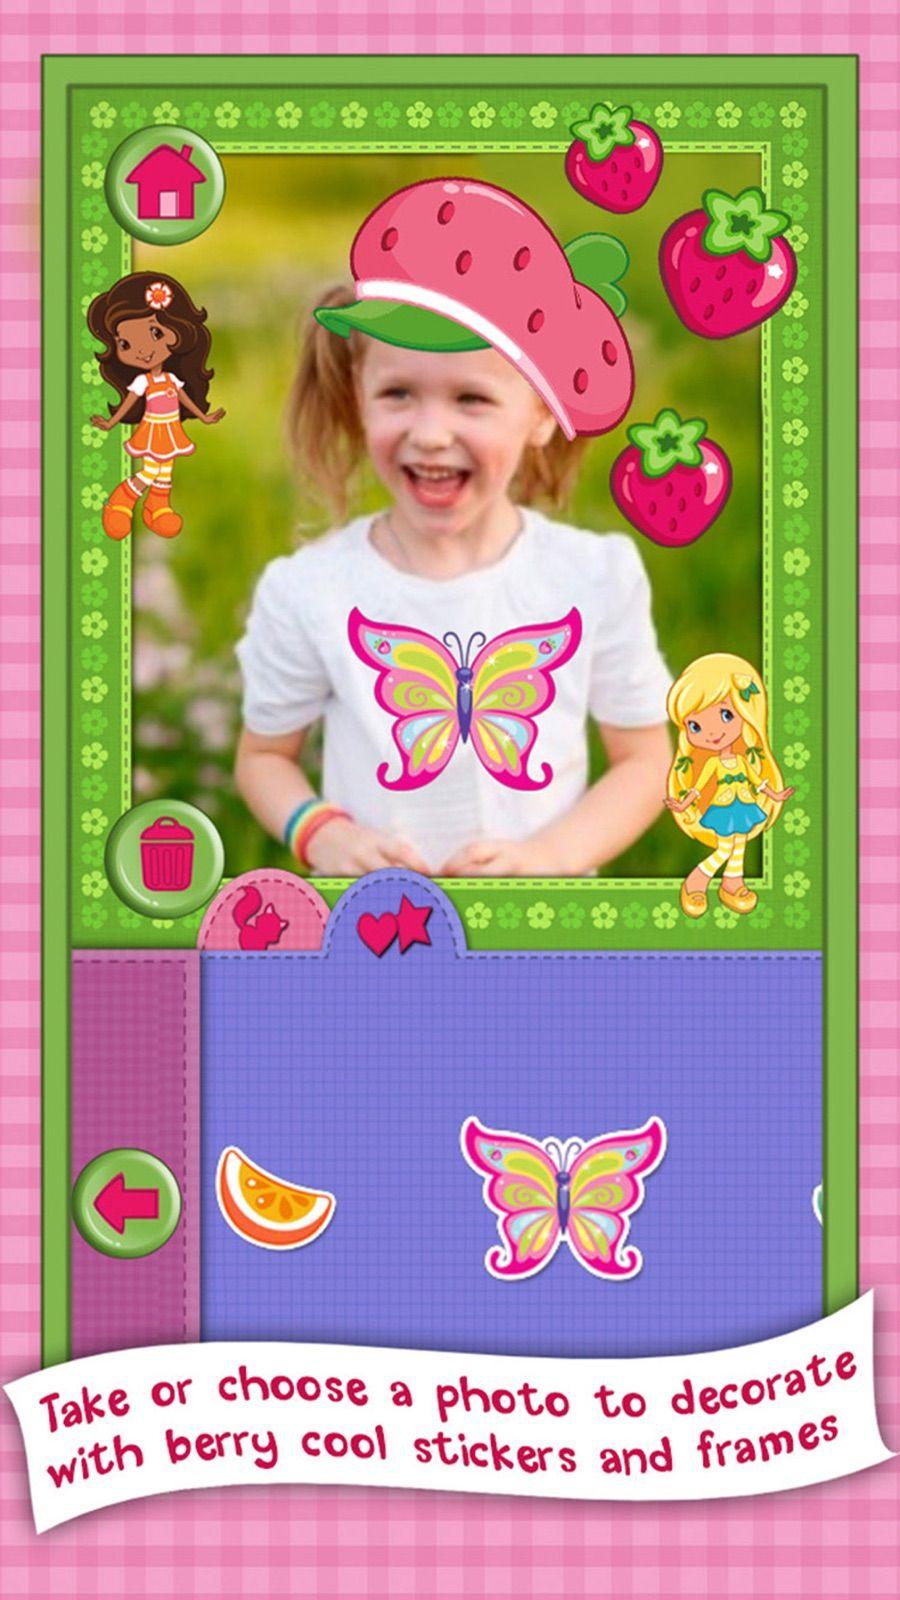 Strawberry Shortcake Card Maker Dress Up Fashion